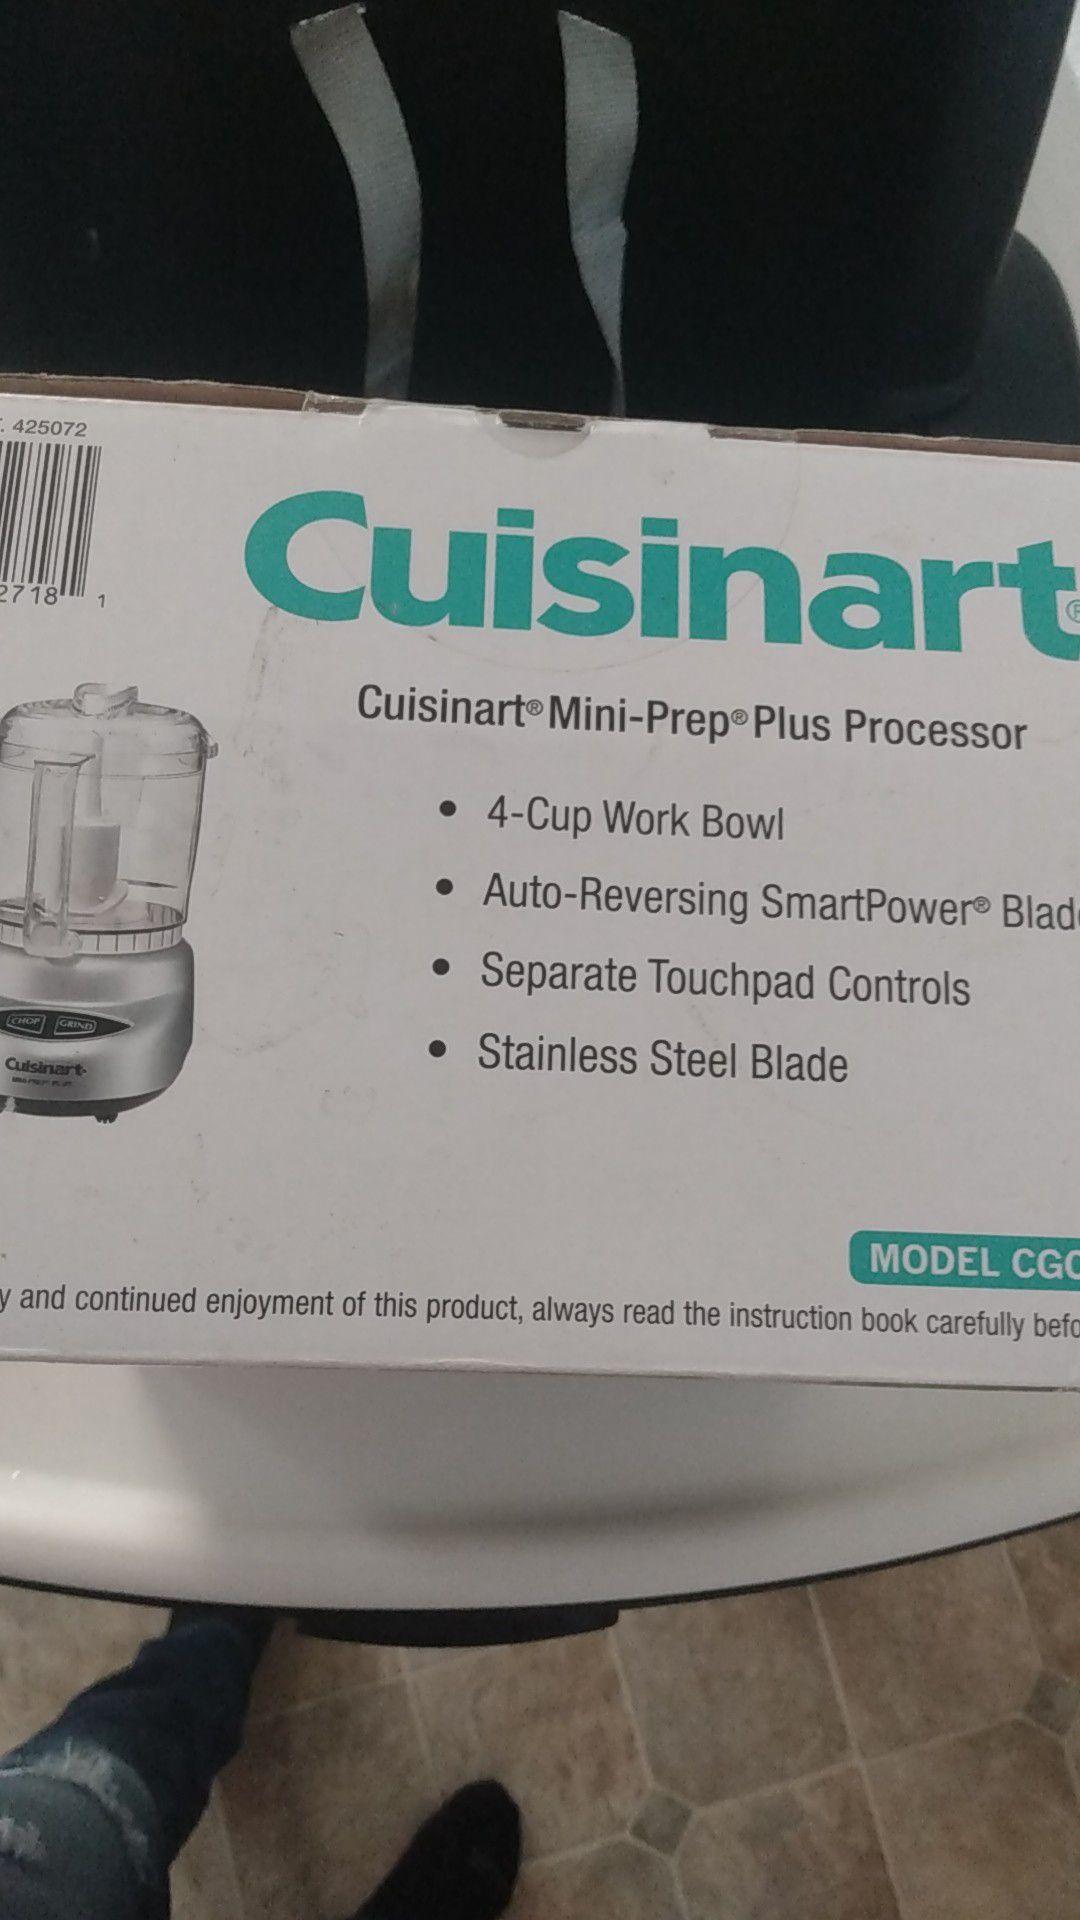 Cuisinart Mini-Prep Plus Processor